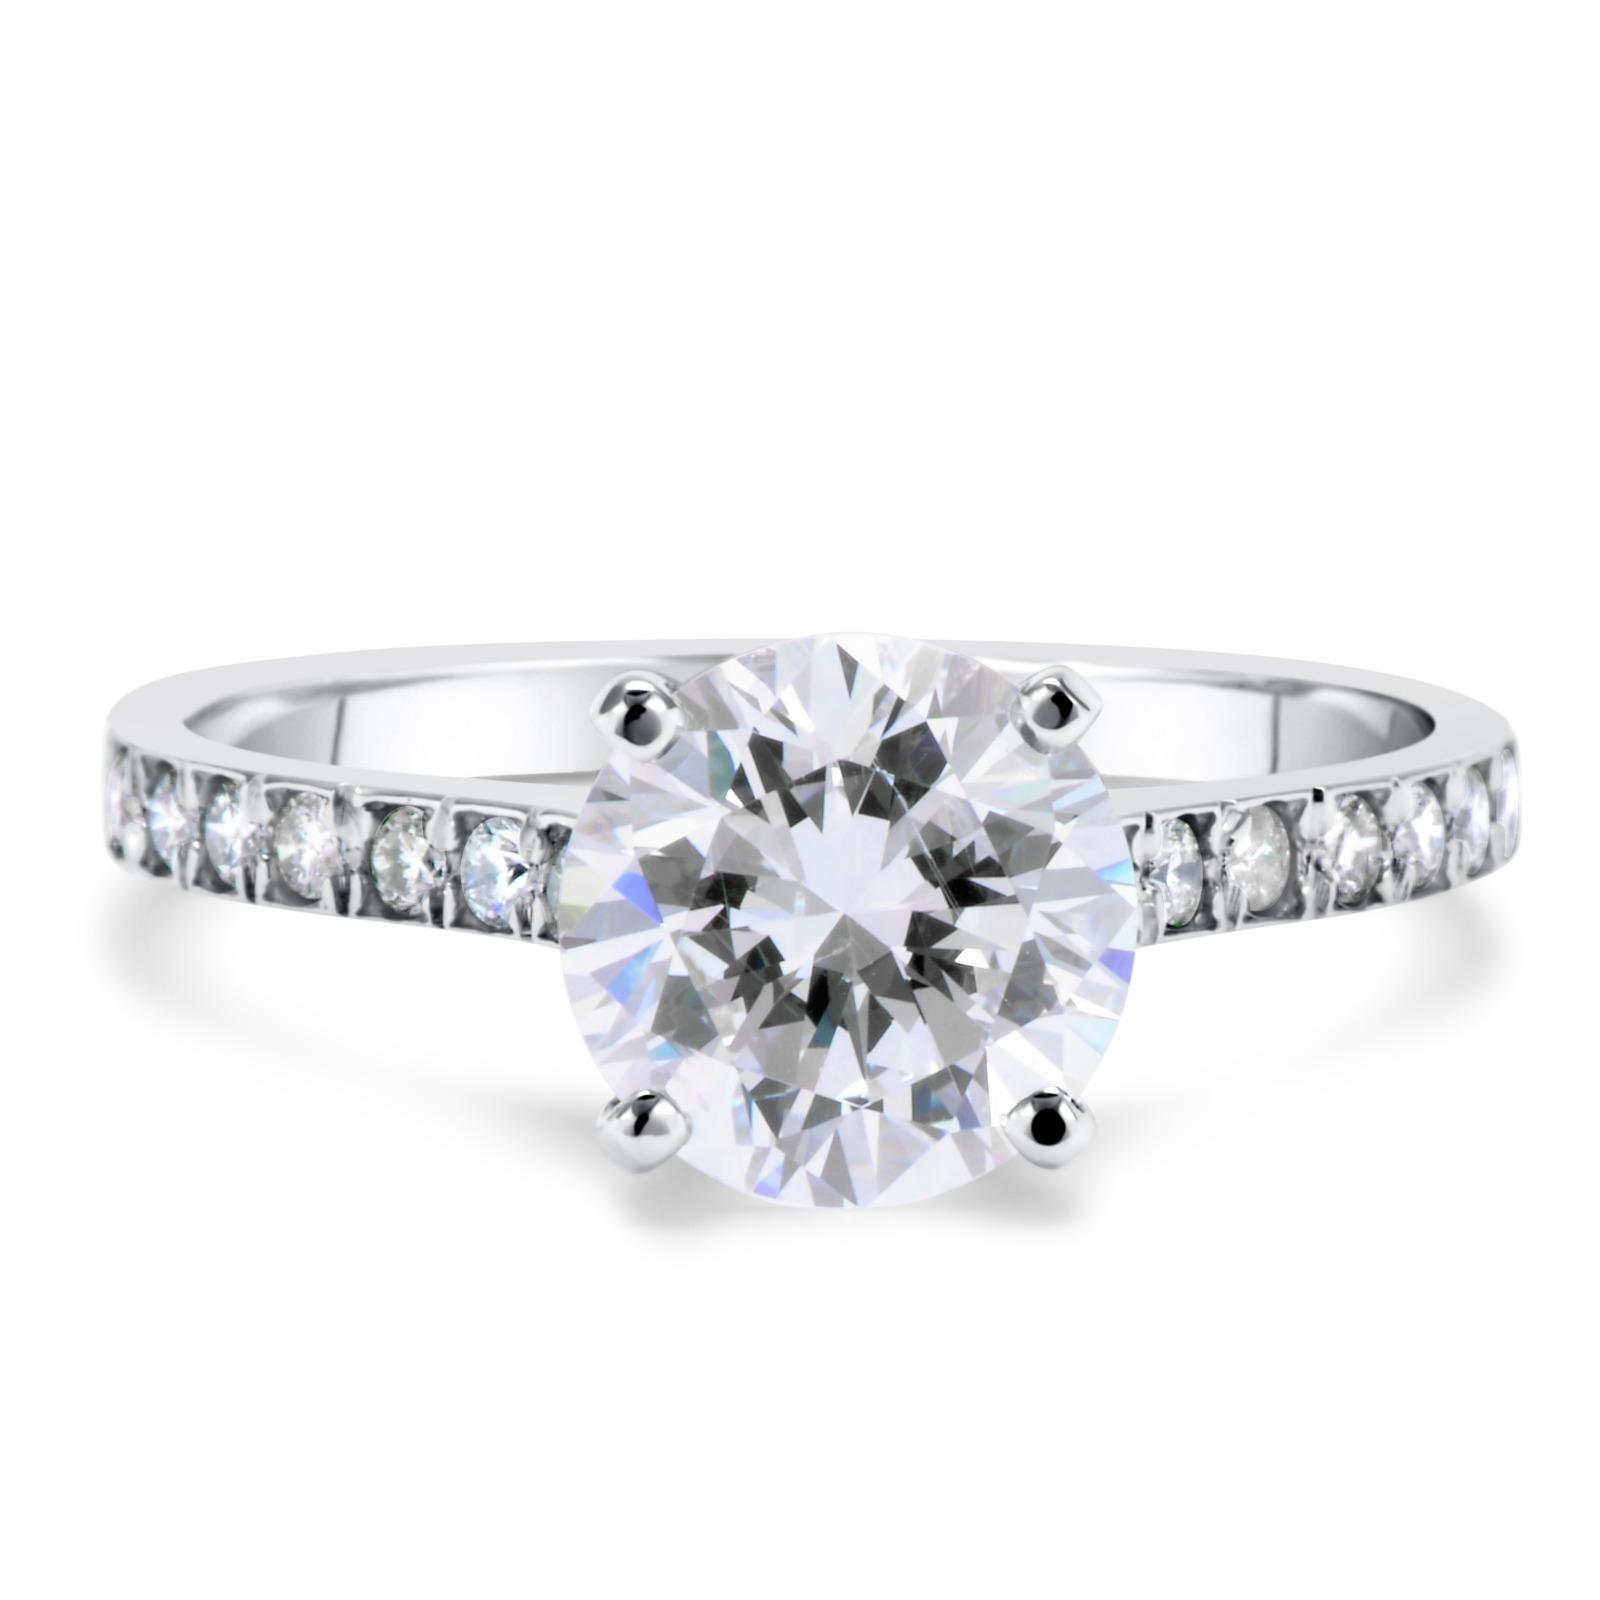 Vvs1 Engagement Ring 2 Carat Round Cut 14k White Gold Bridal Jewelry